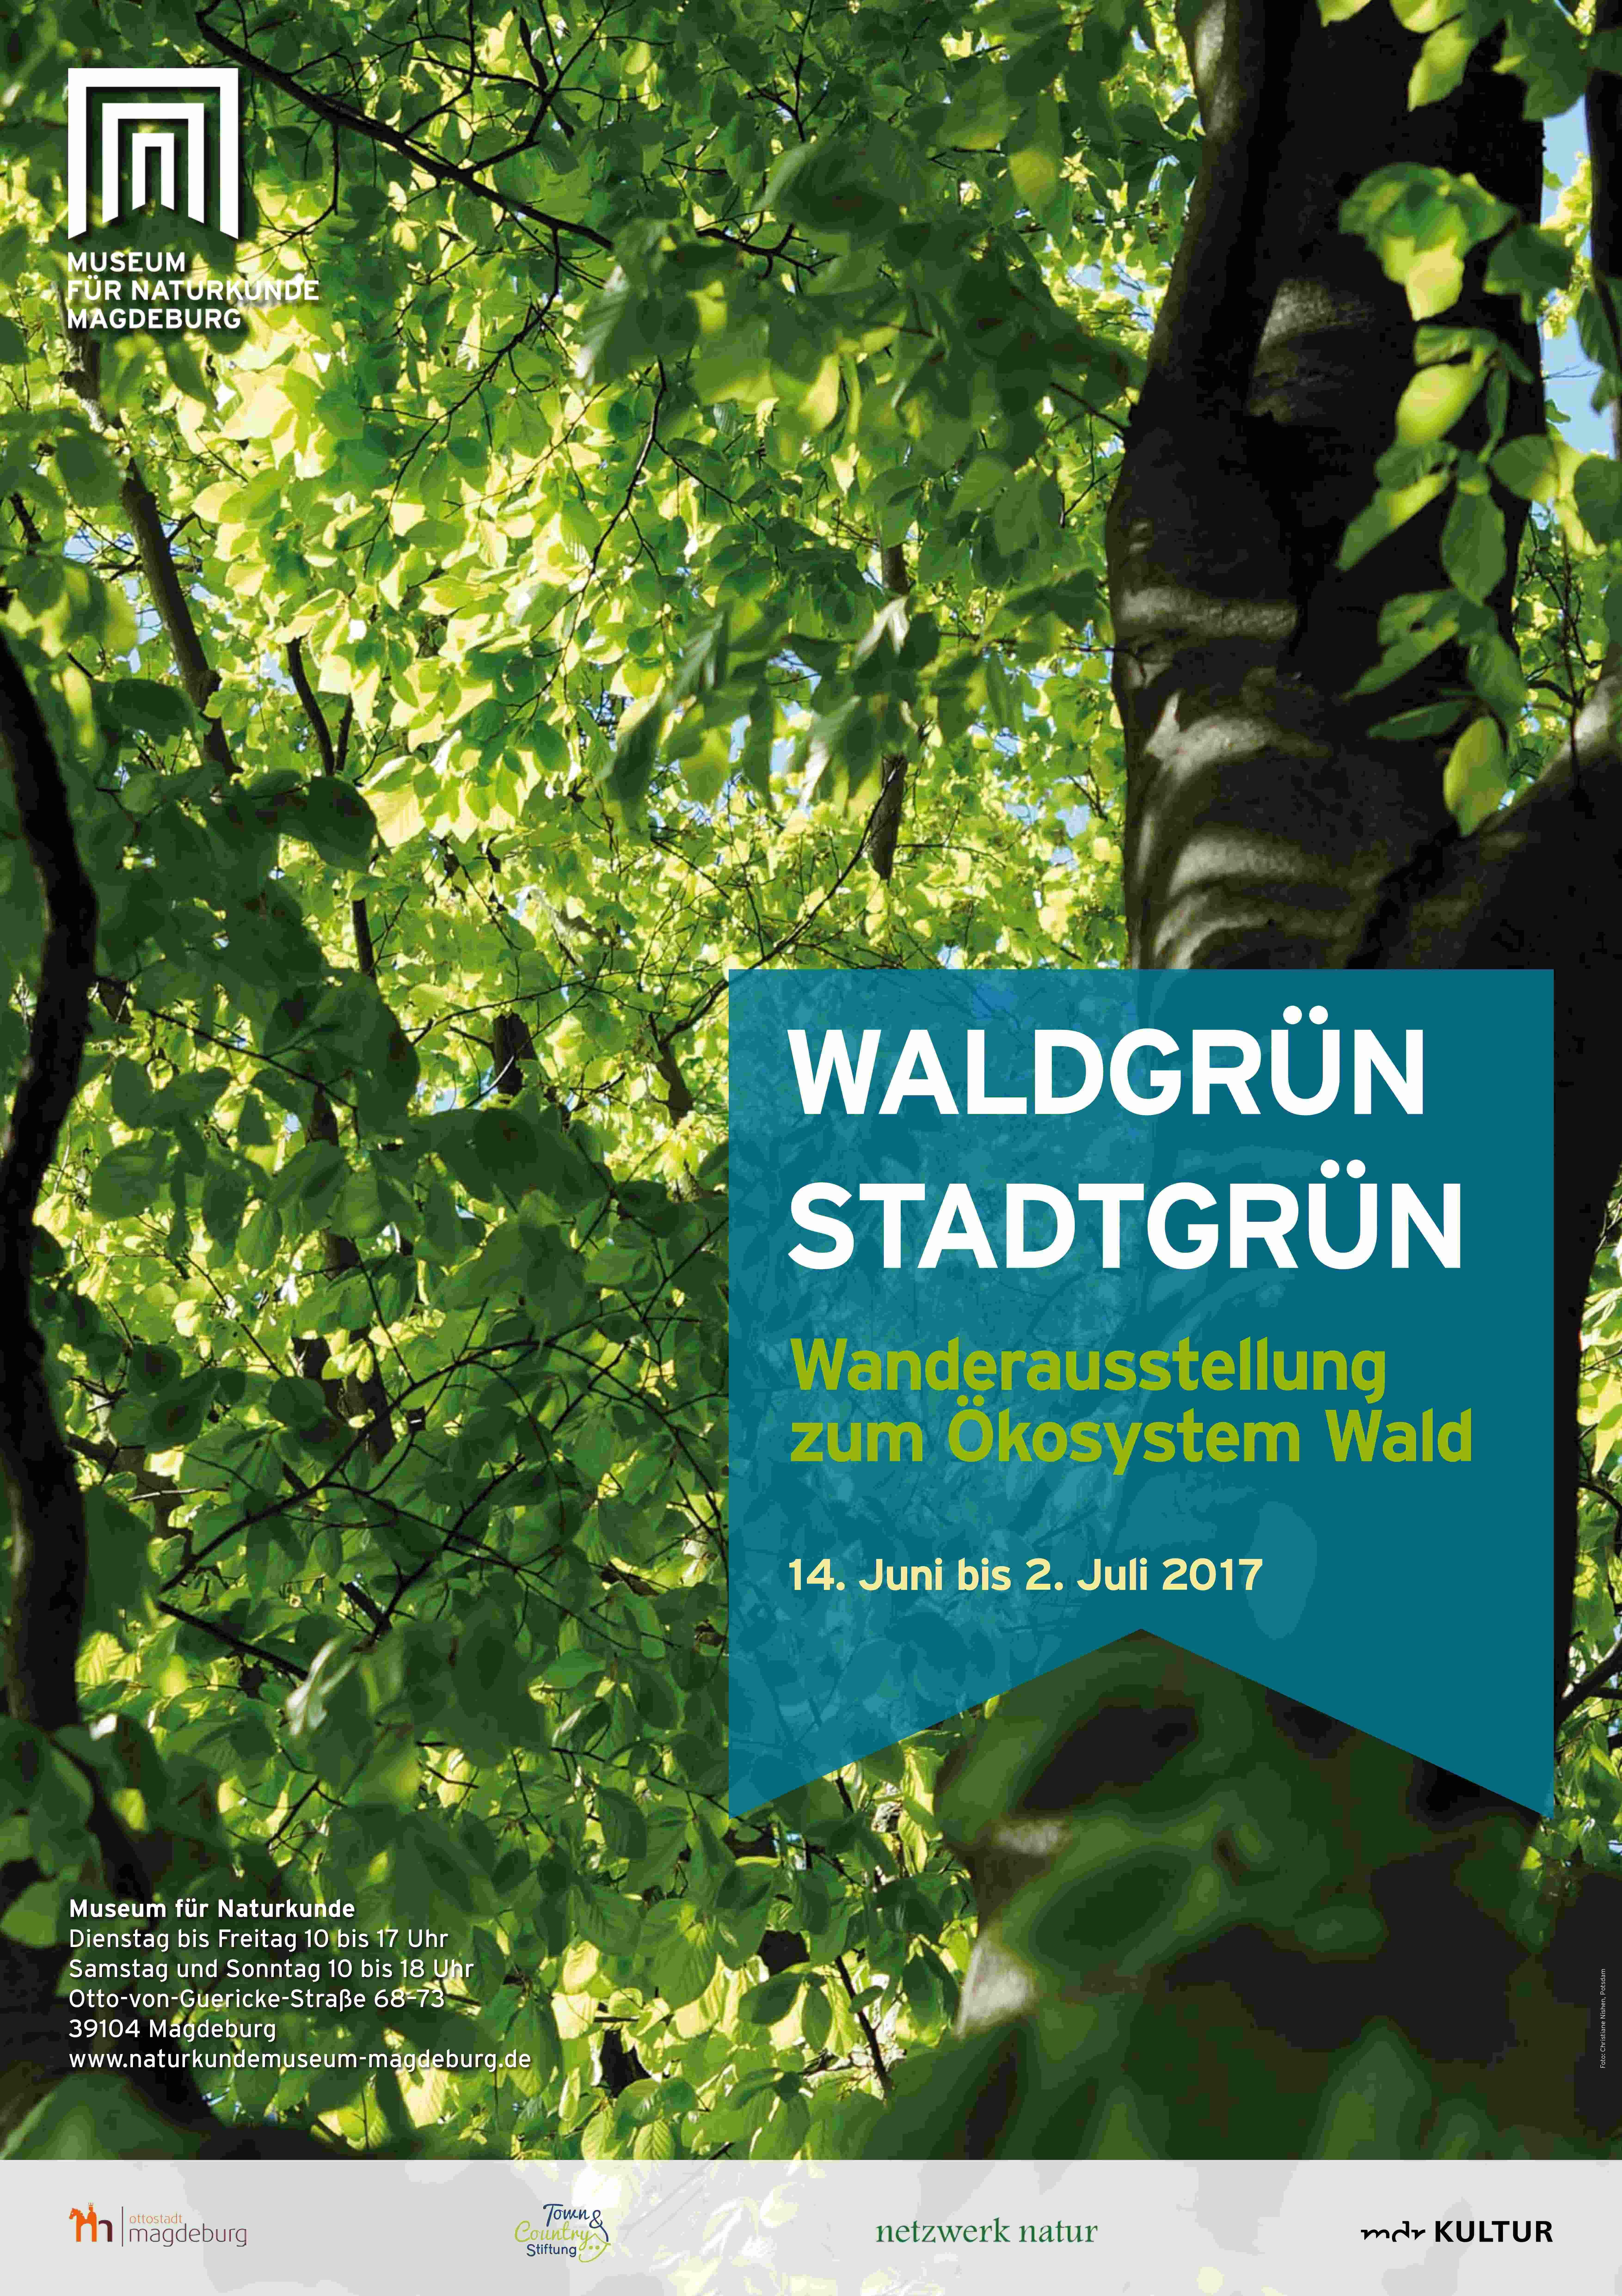 netzwerk natur, Plakat zur Wanderausstellung WALDGRÜN - STADTGRÜN in Magdeburg